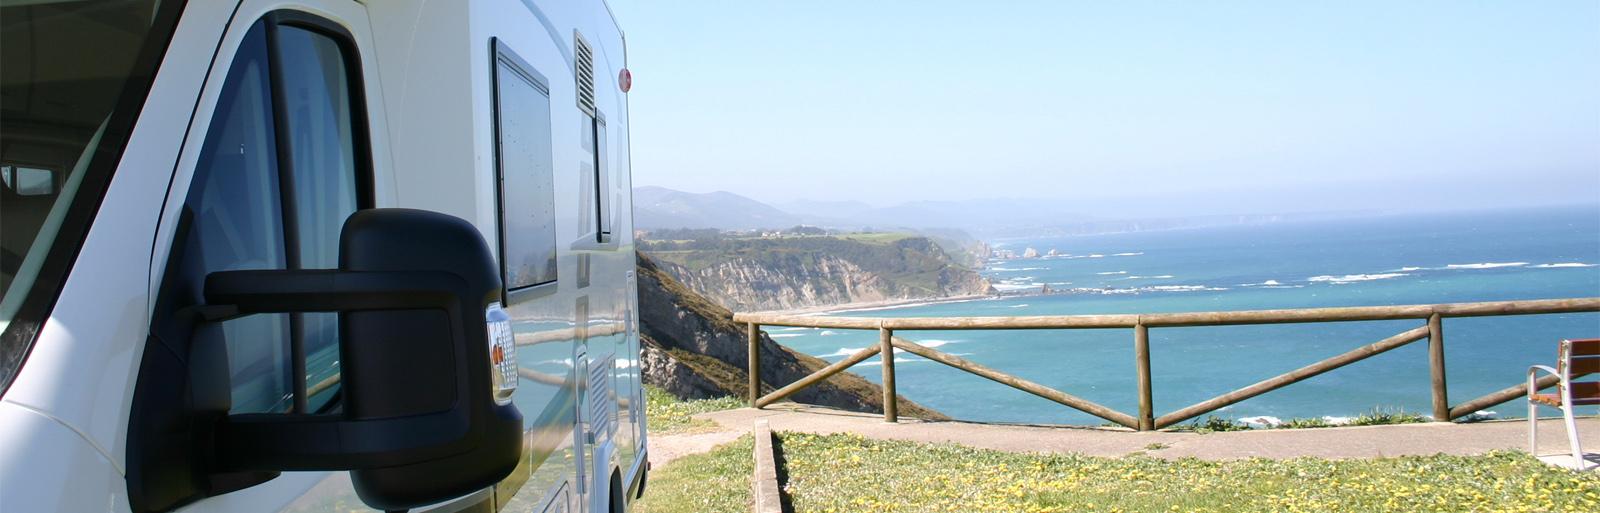 Alquilar autocaravanas en Asturias